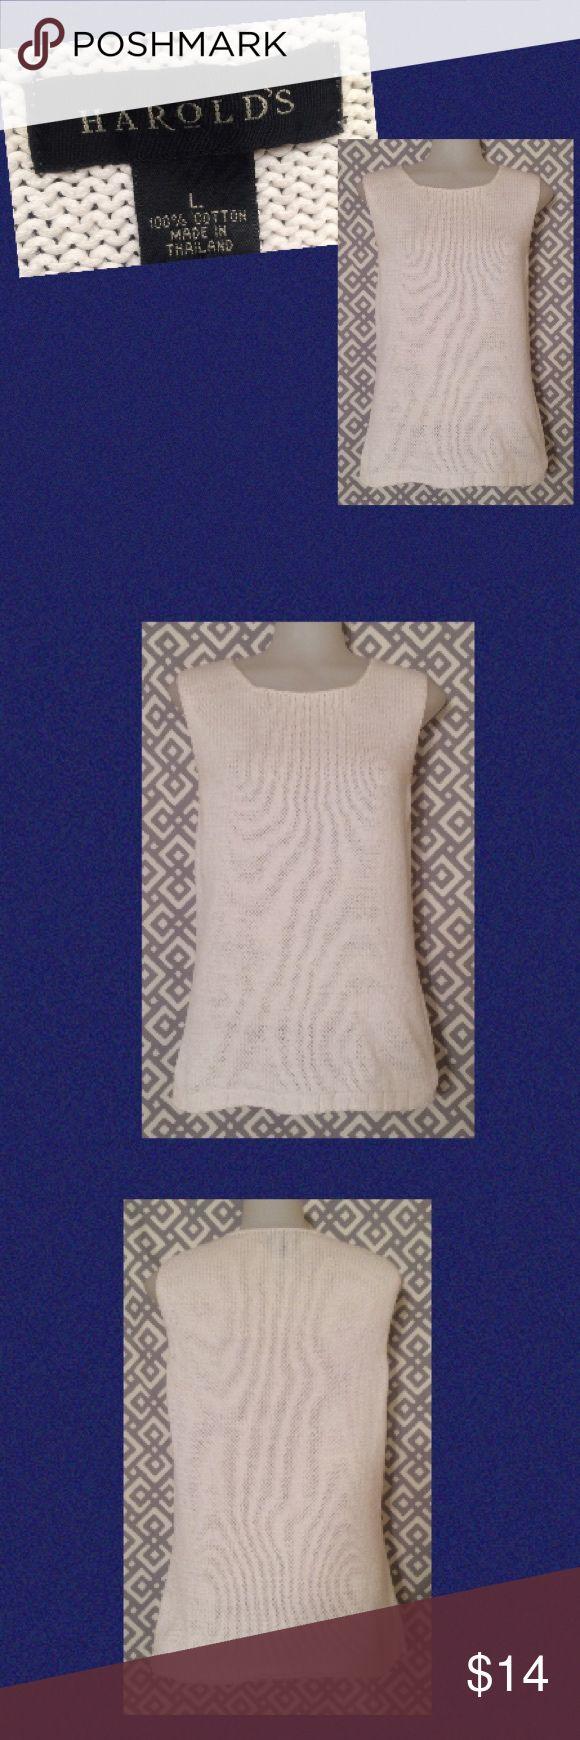 Harold's, L sleeveless sweater - white White sleeveless sweater top Harold's Sweaters